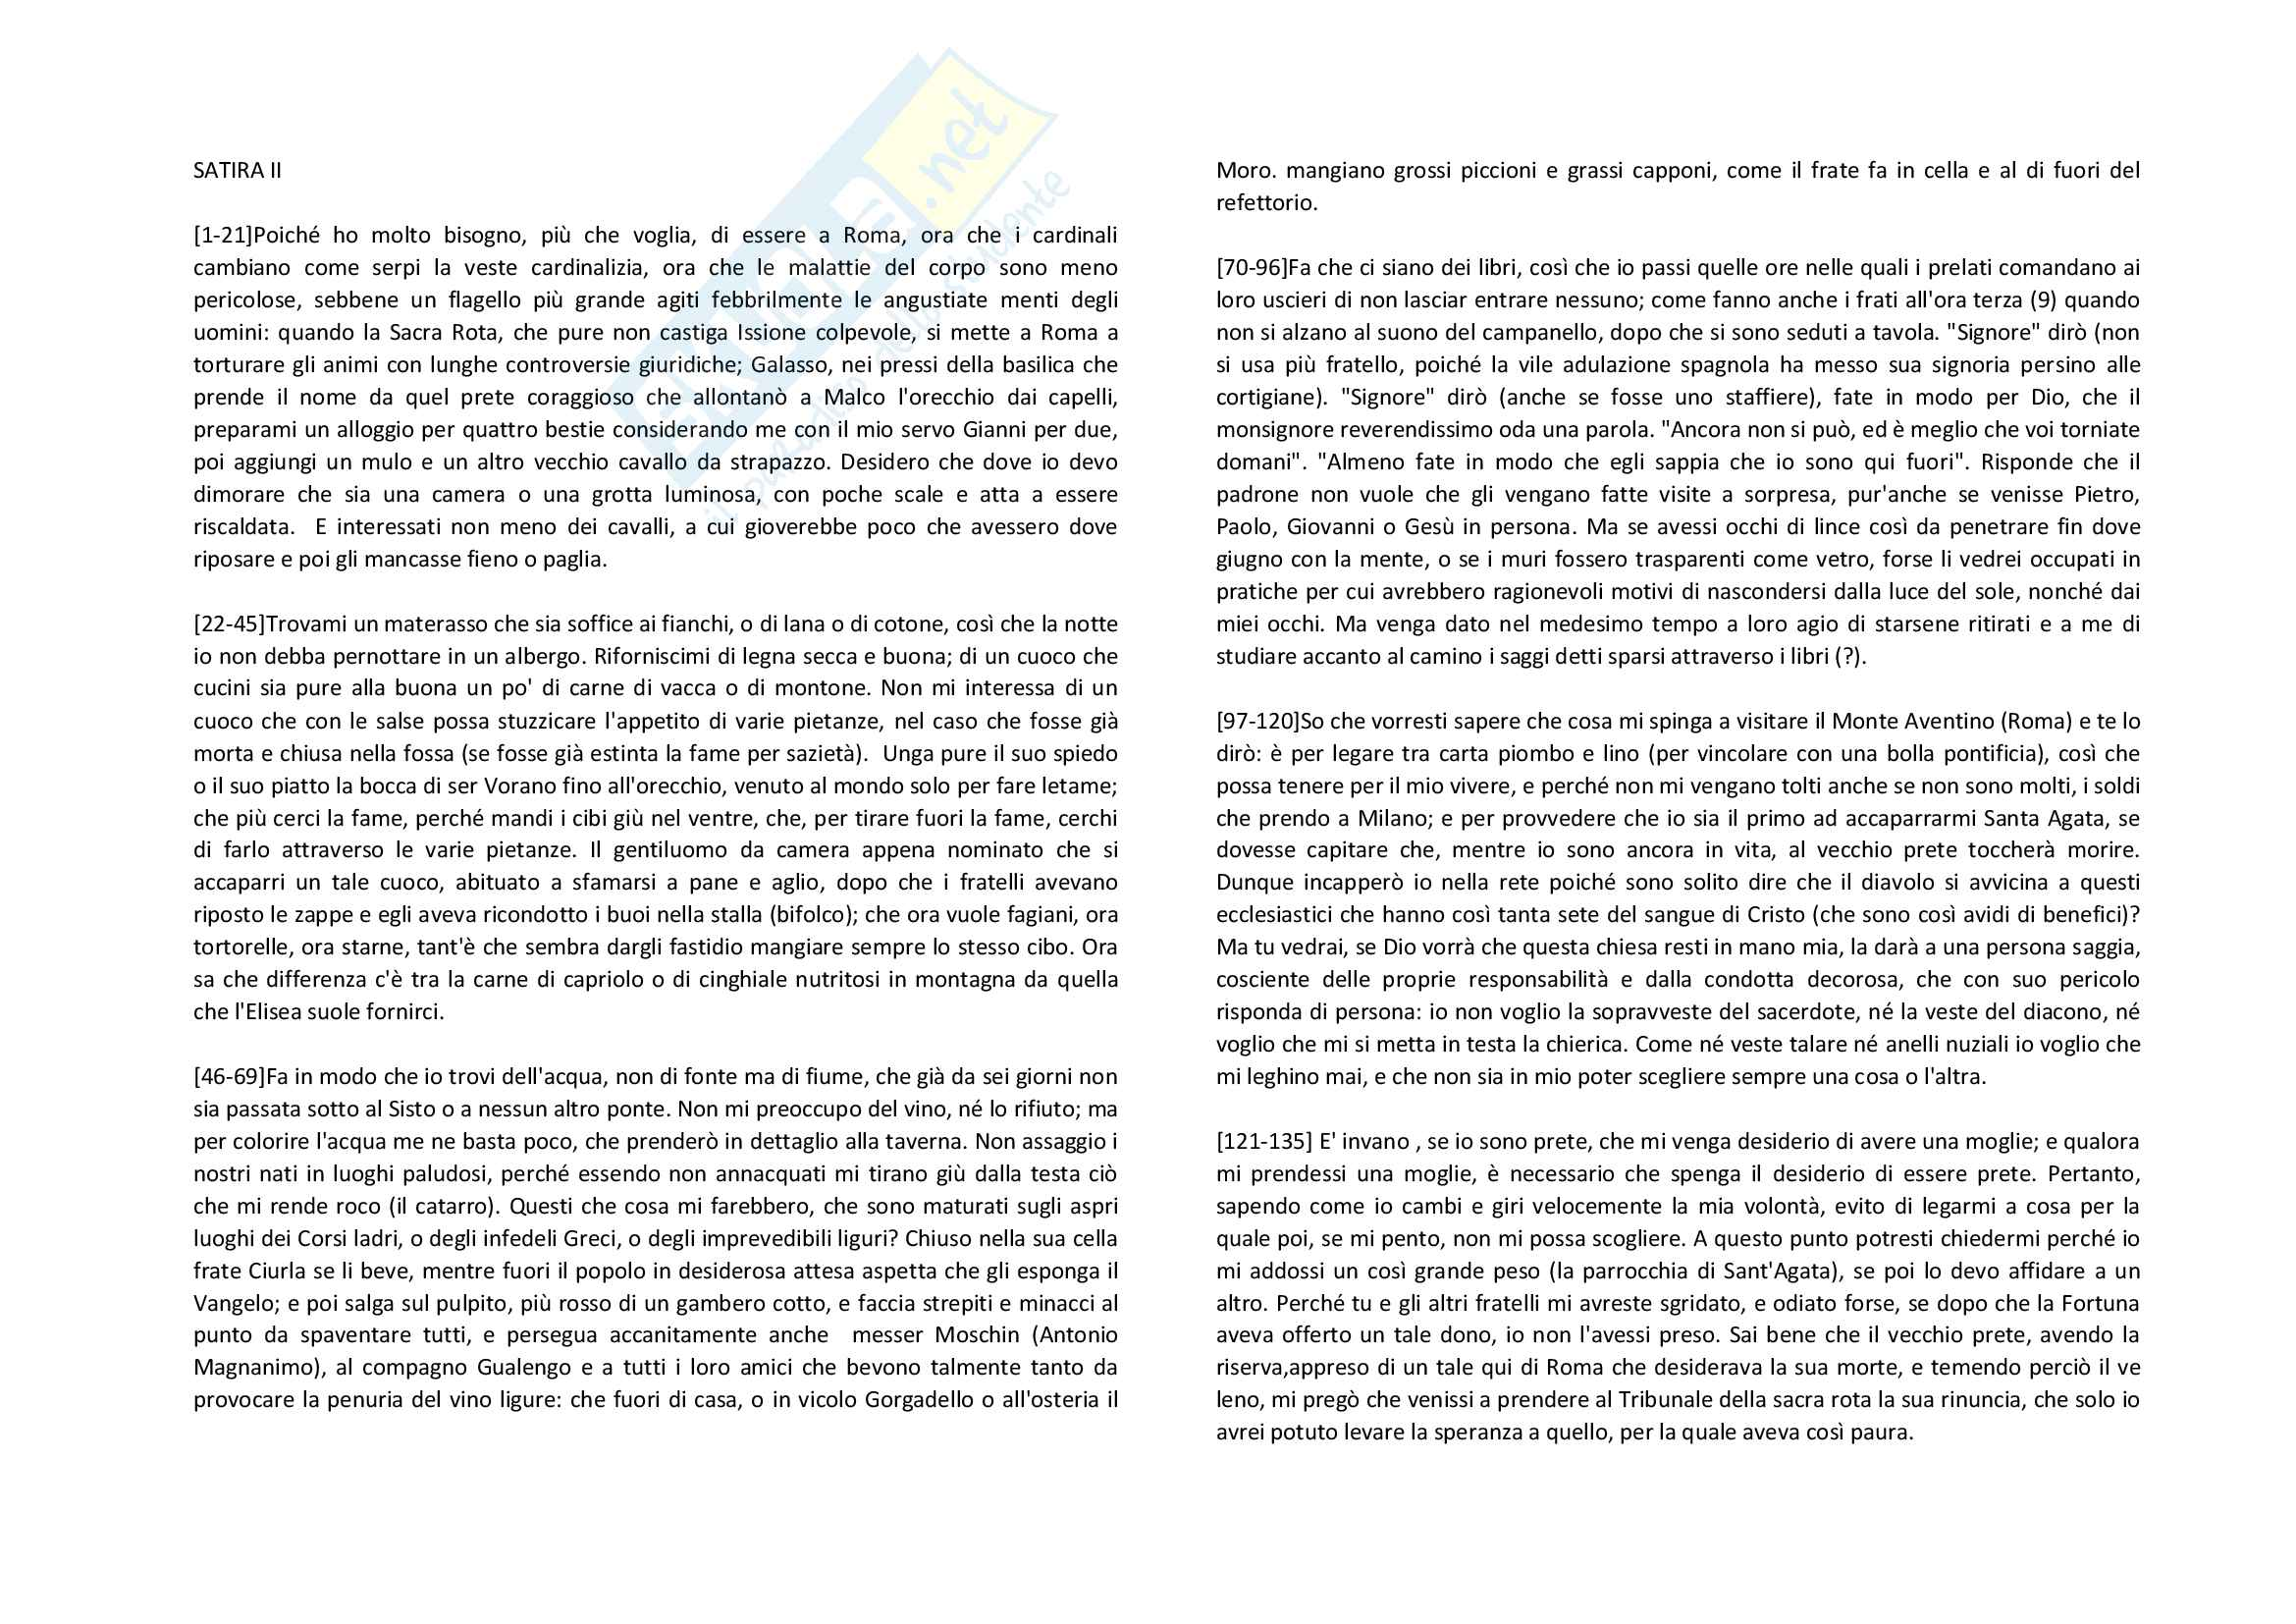 Parafrasi satira II Ariosto